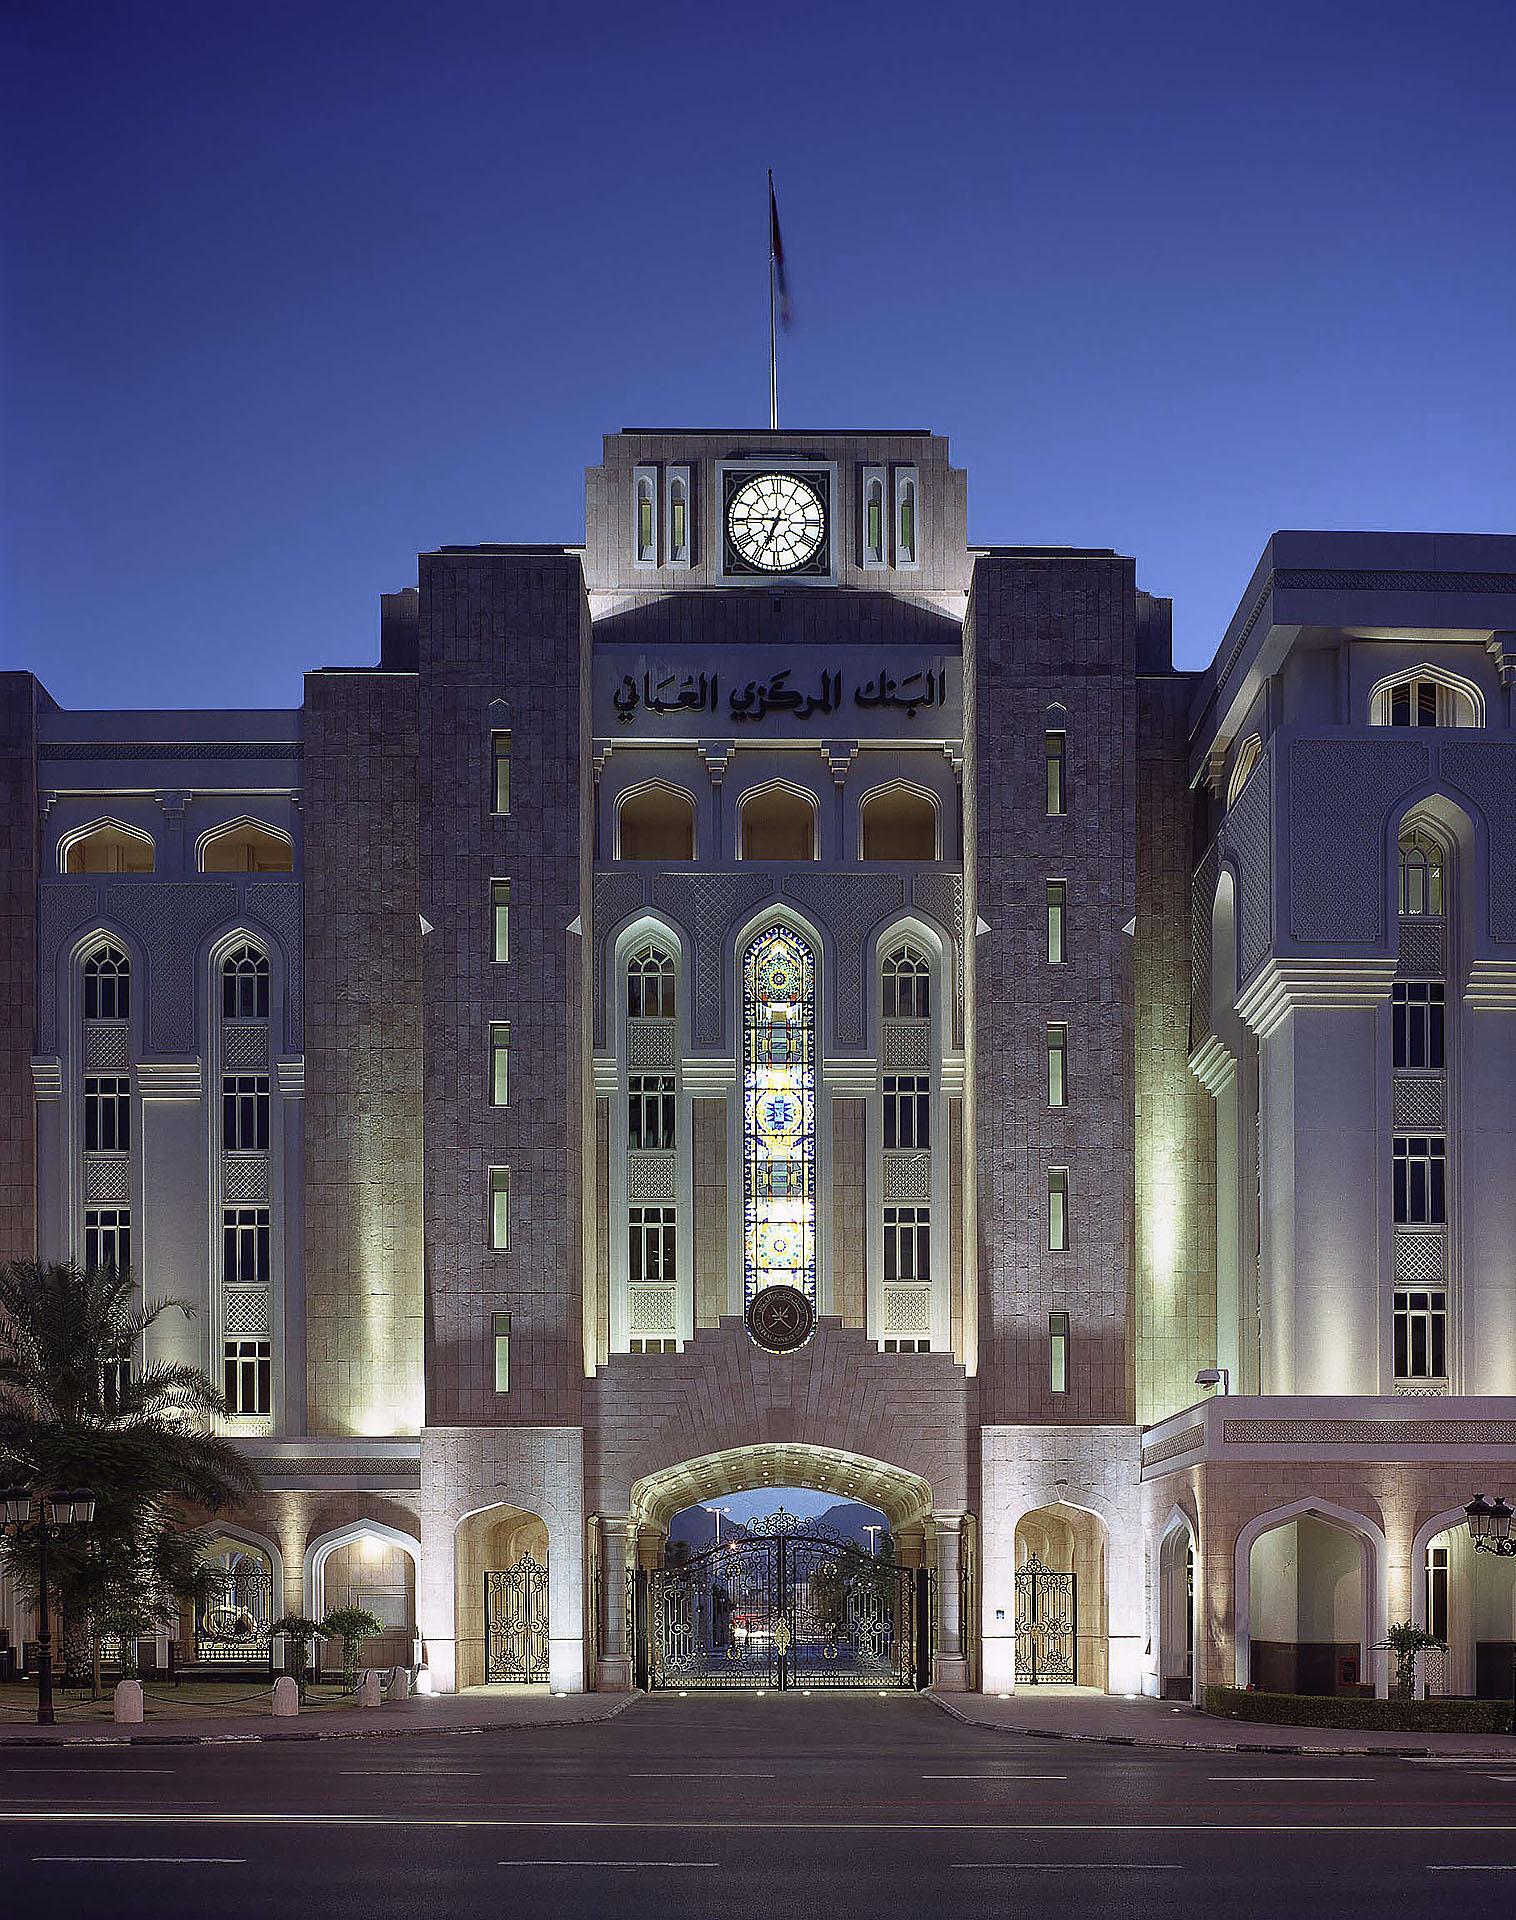 Central Bank of Oman (CBO)